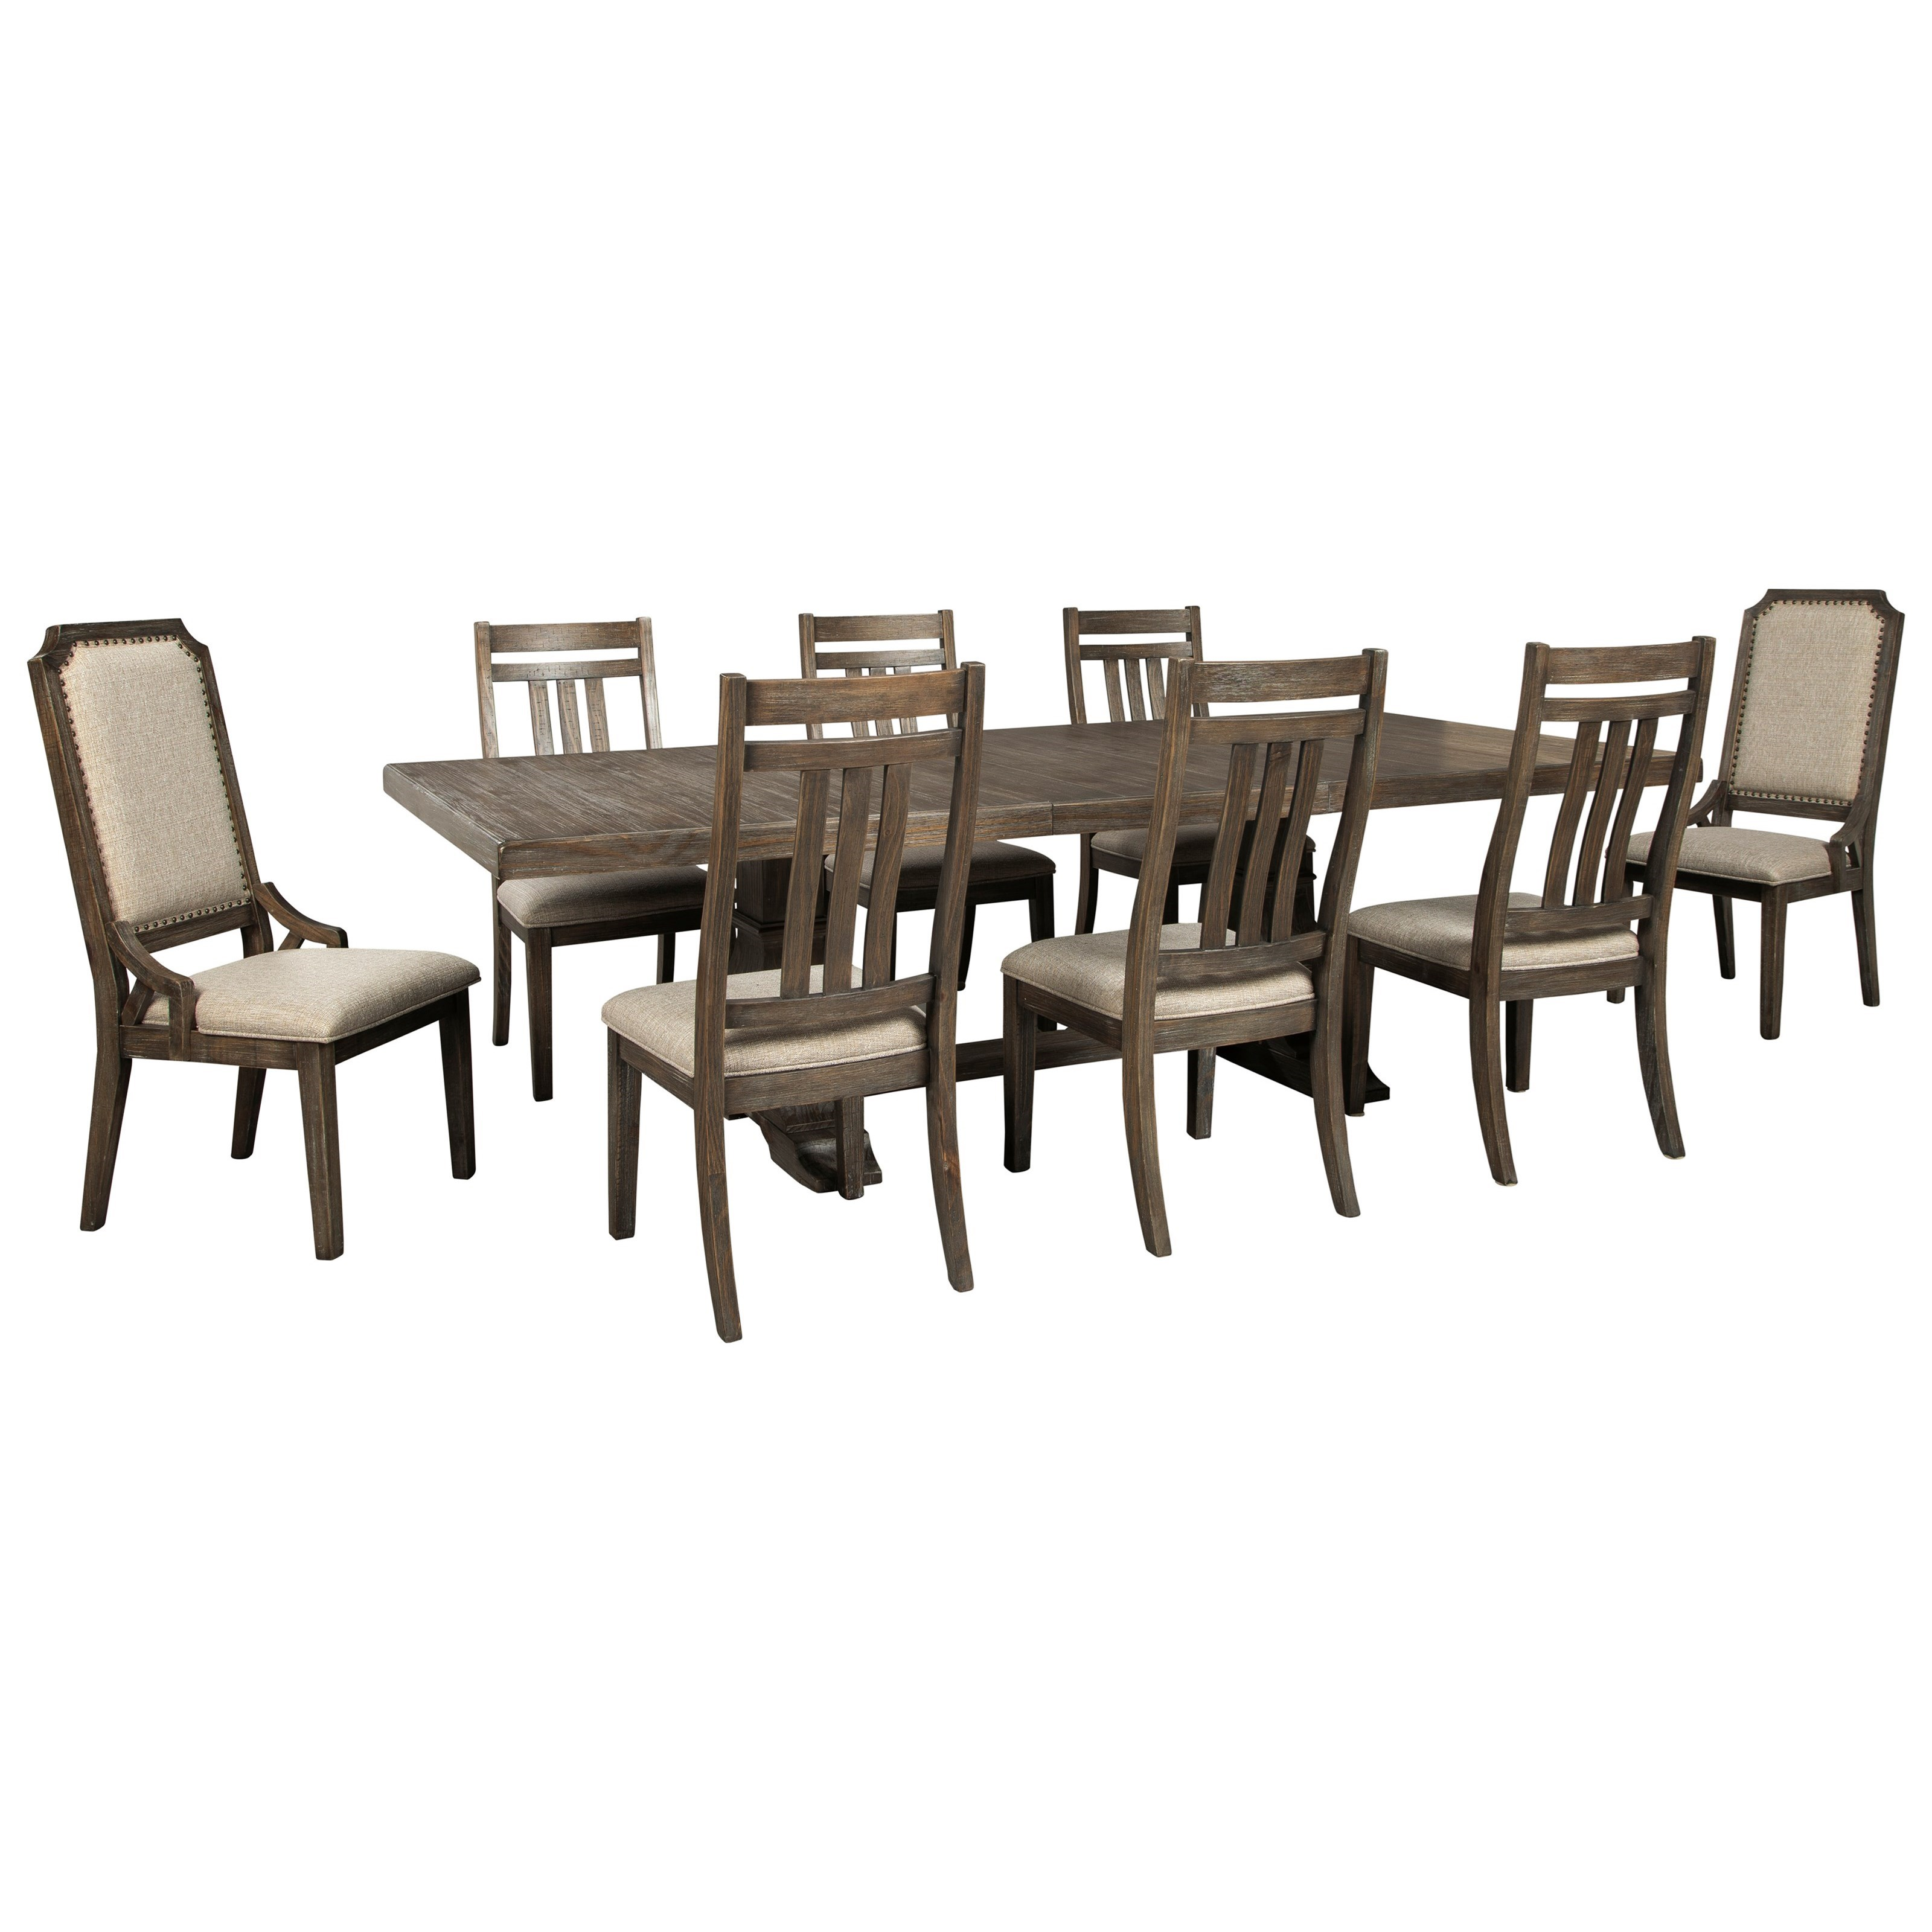 Wyndahl 9-Piece Dining Table Set by Ashley (Signature Design) at Johnny Janosik